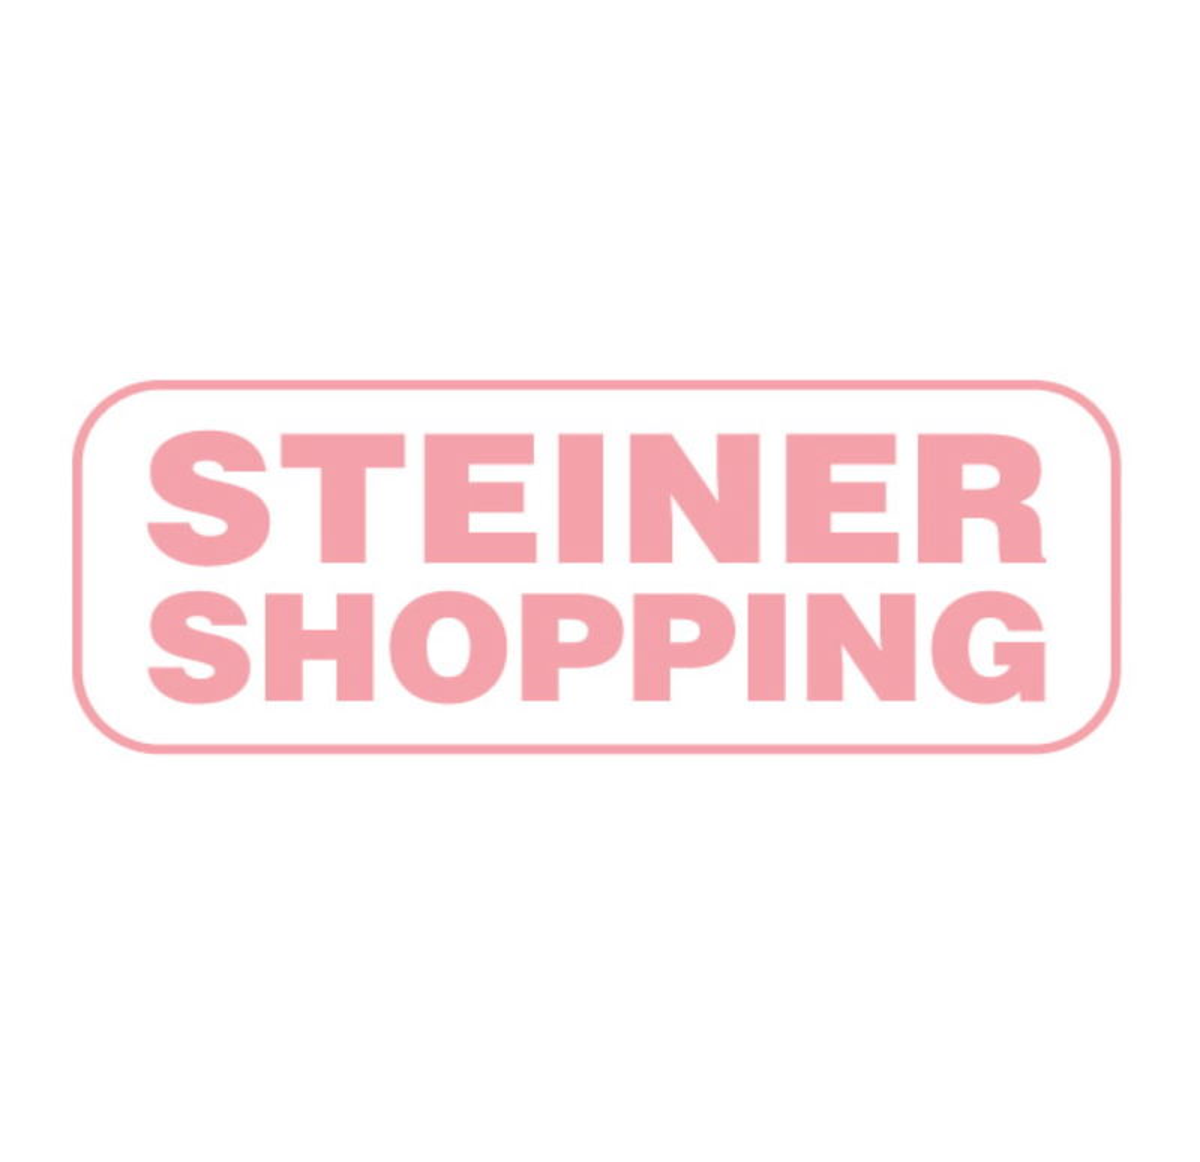 TV-Unterschrank Kiefer massiv Vollholz weiß lackiert Junco 204 - Abmessung 50 x 77 x 40 cm